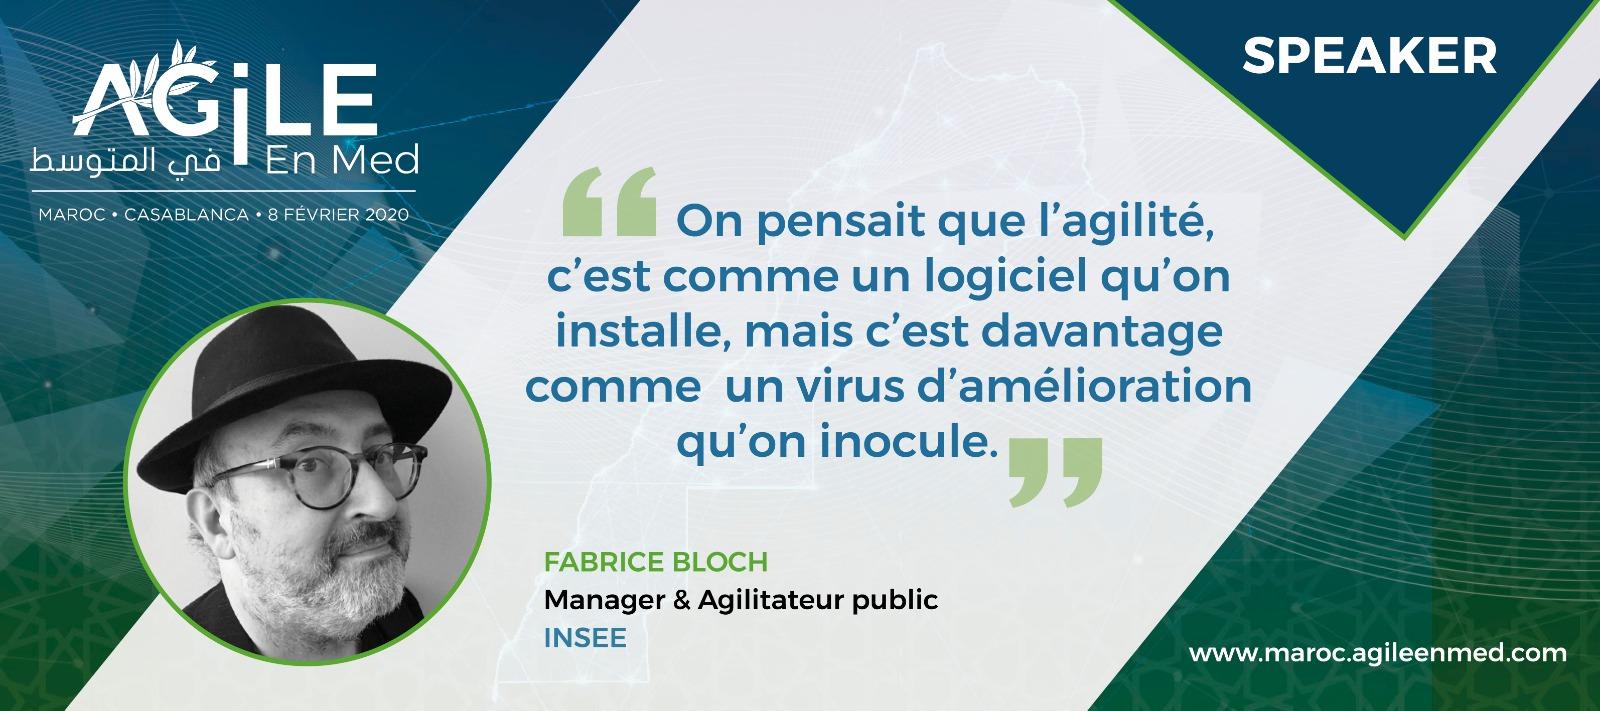 Fabrice Bloch